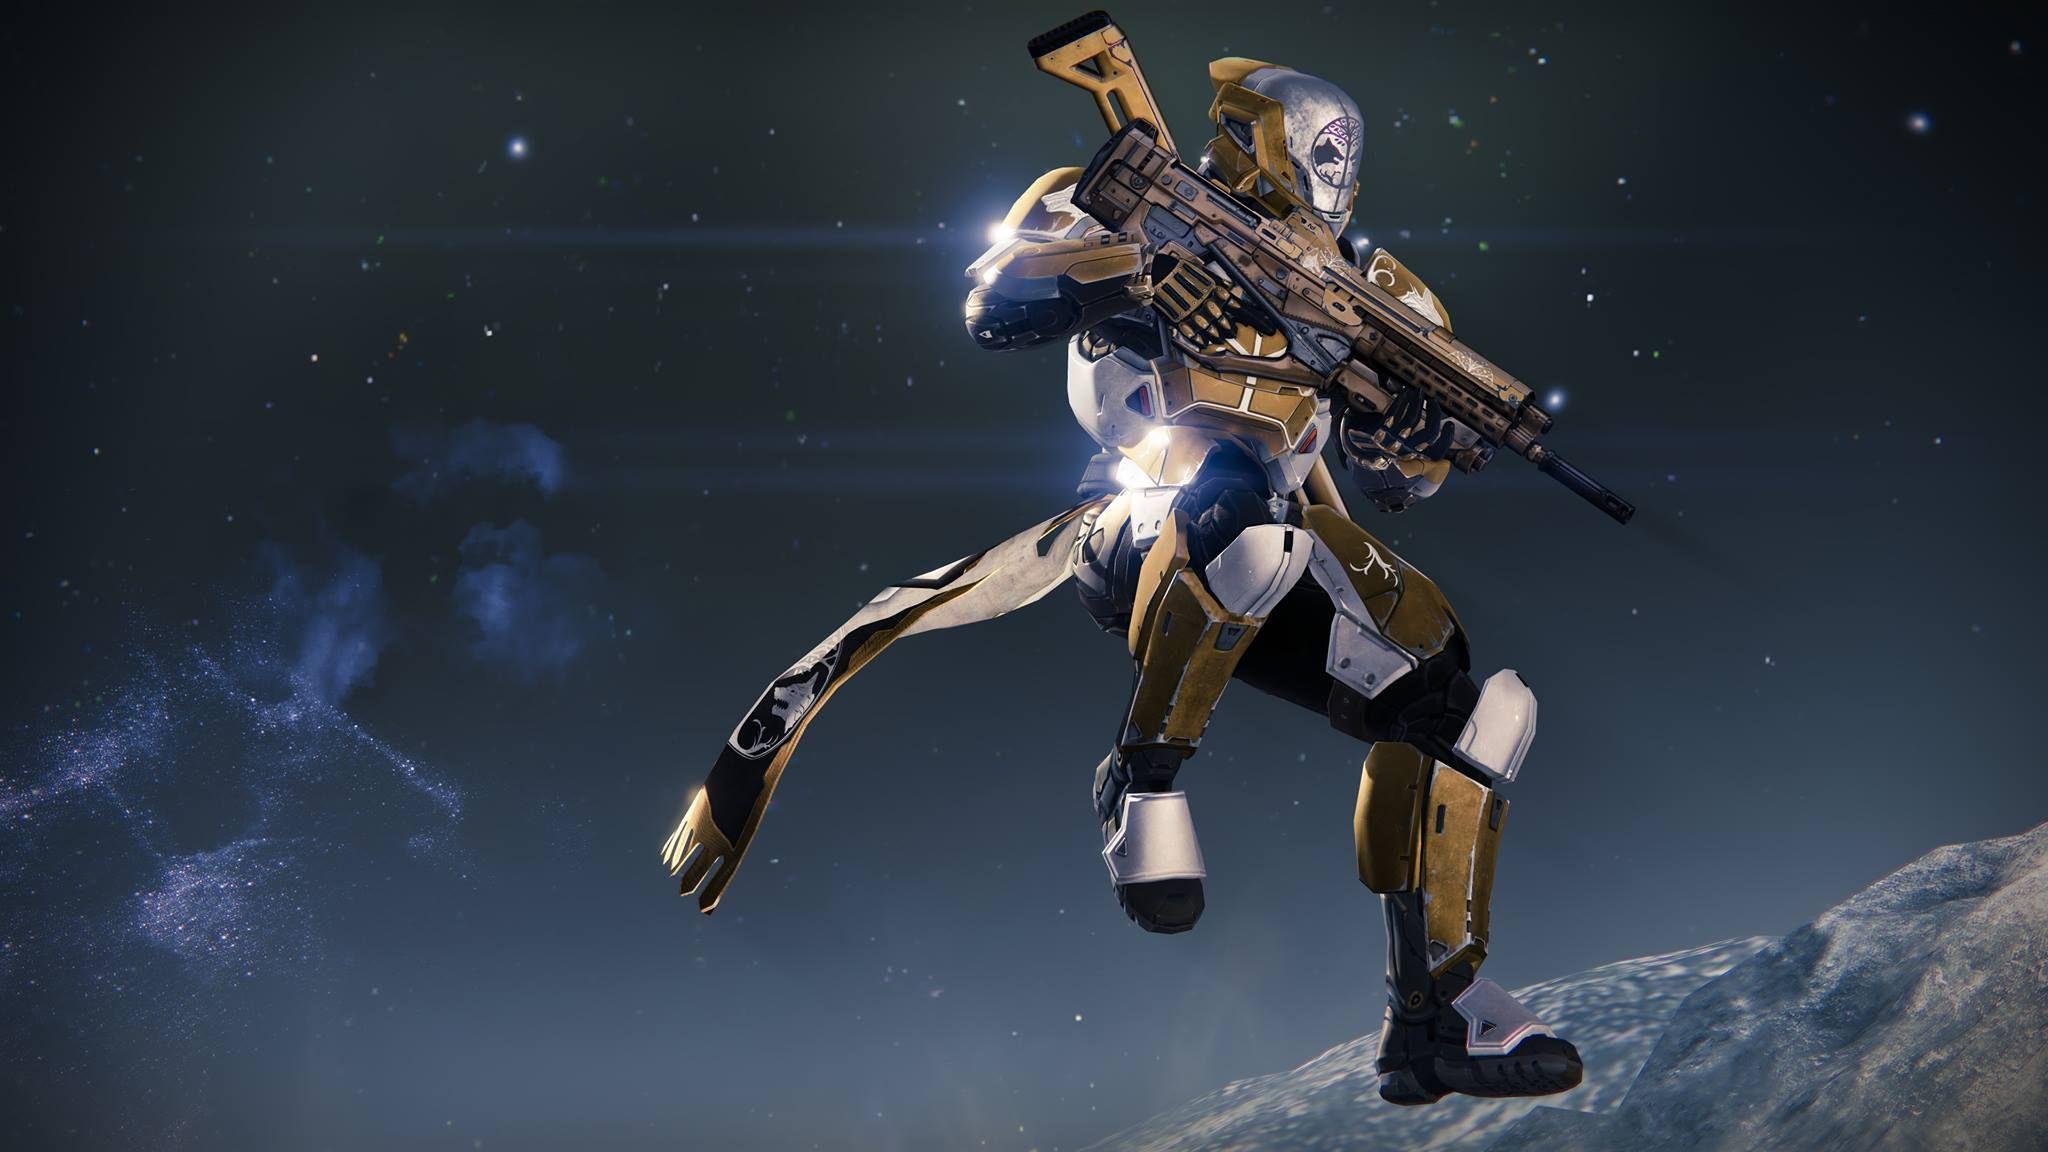 'Destiny' Iron Banner Titan Armor | Things my hubby like ...